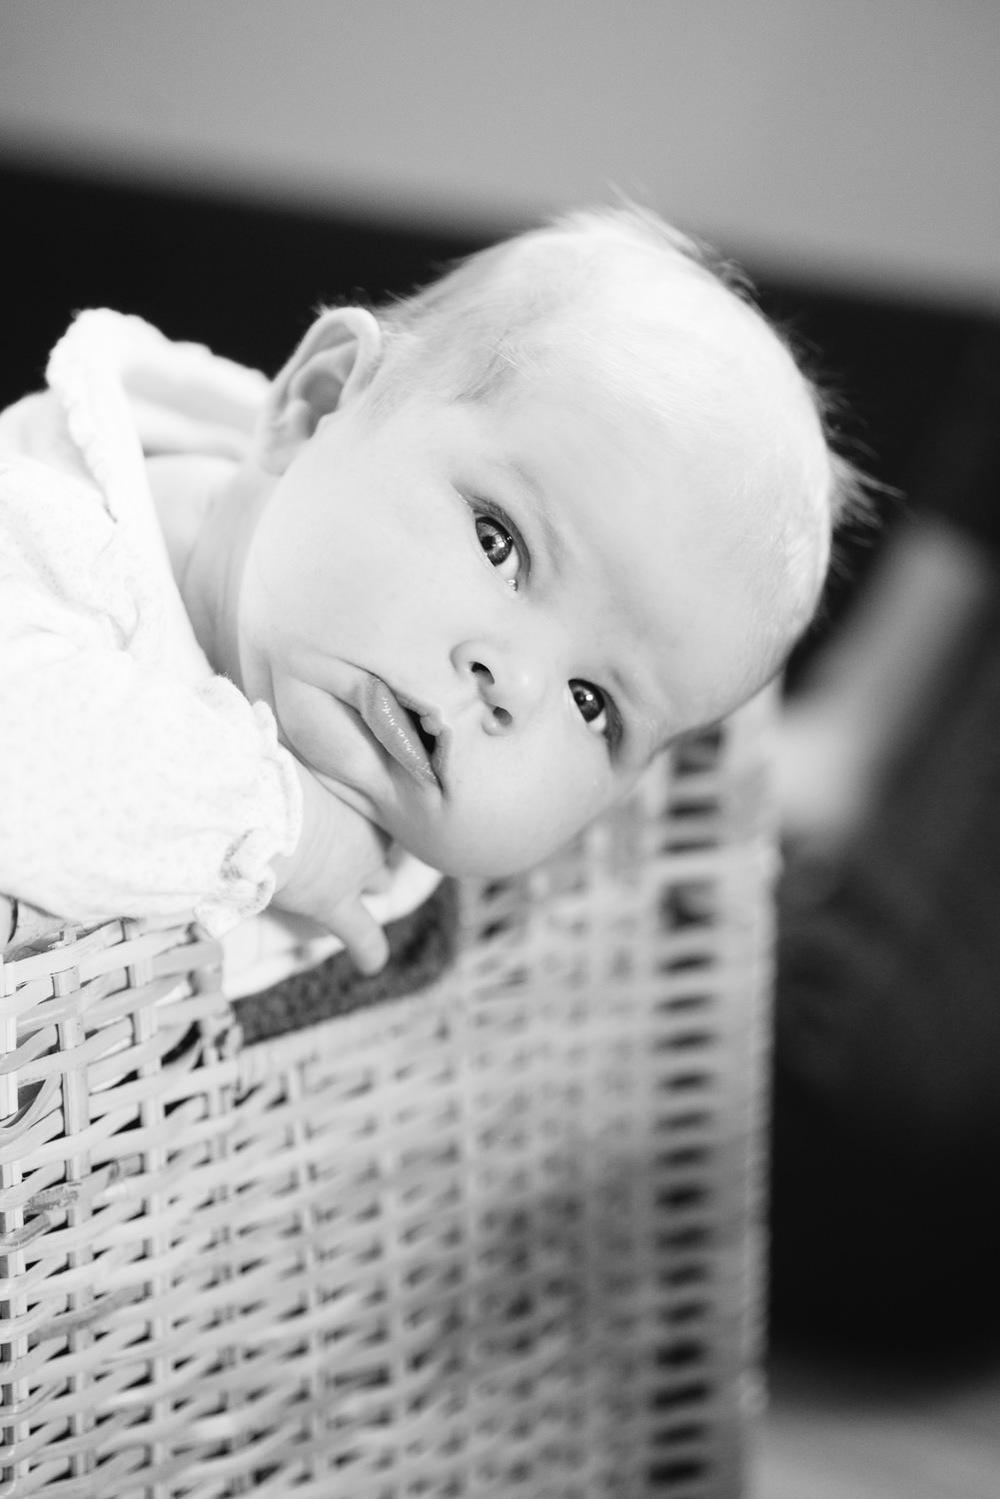 davidiam-portrait-photographer-photography-003.jpg